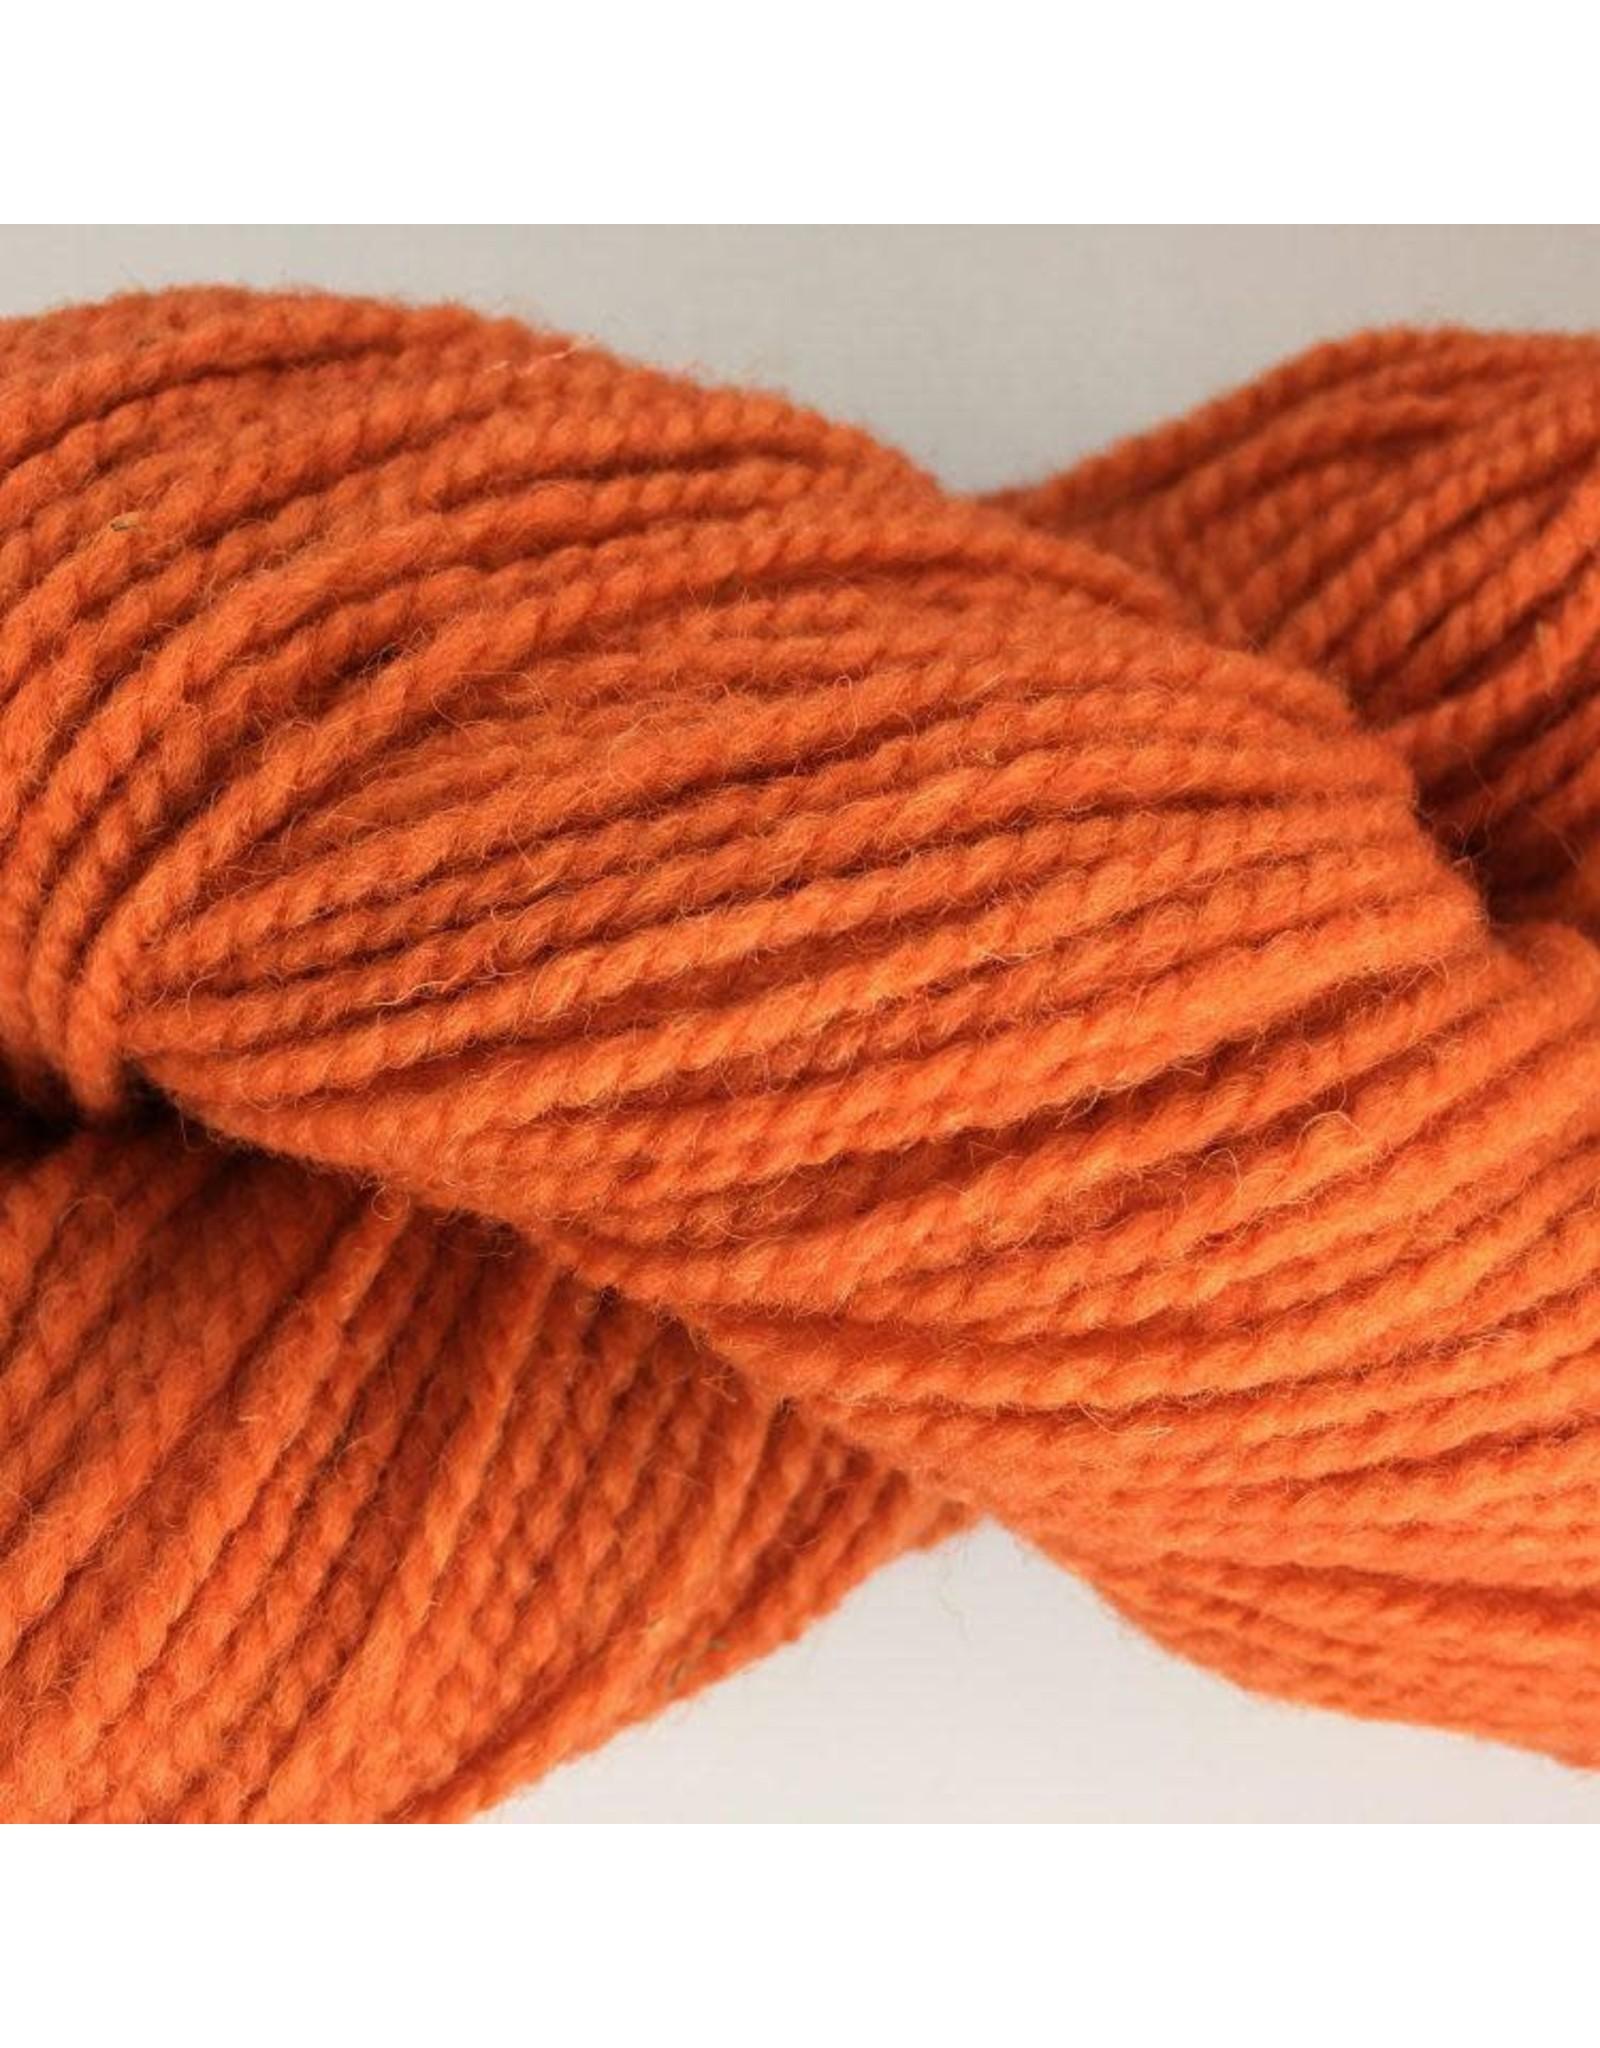 Briggs & Little Heritage 2 Ply - Orange